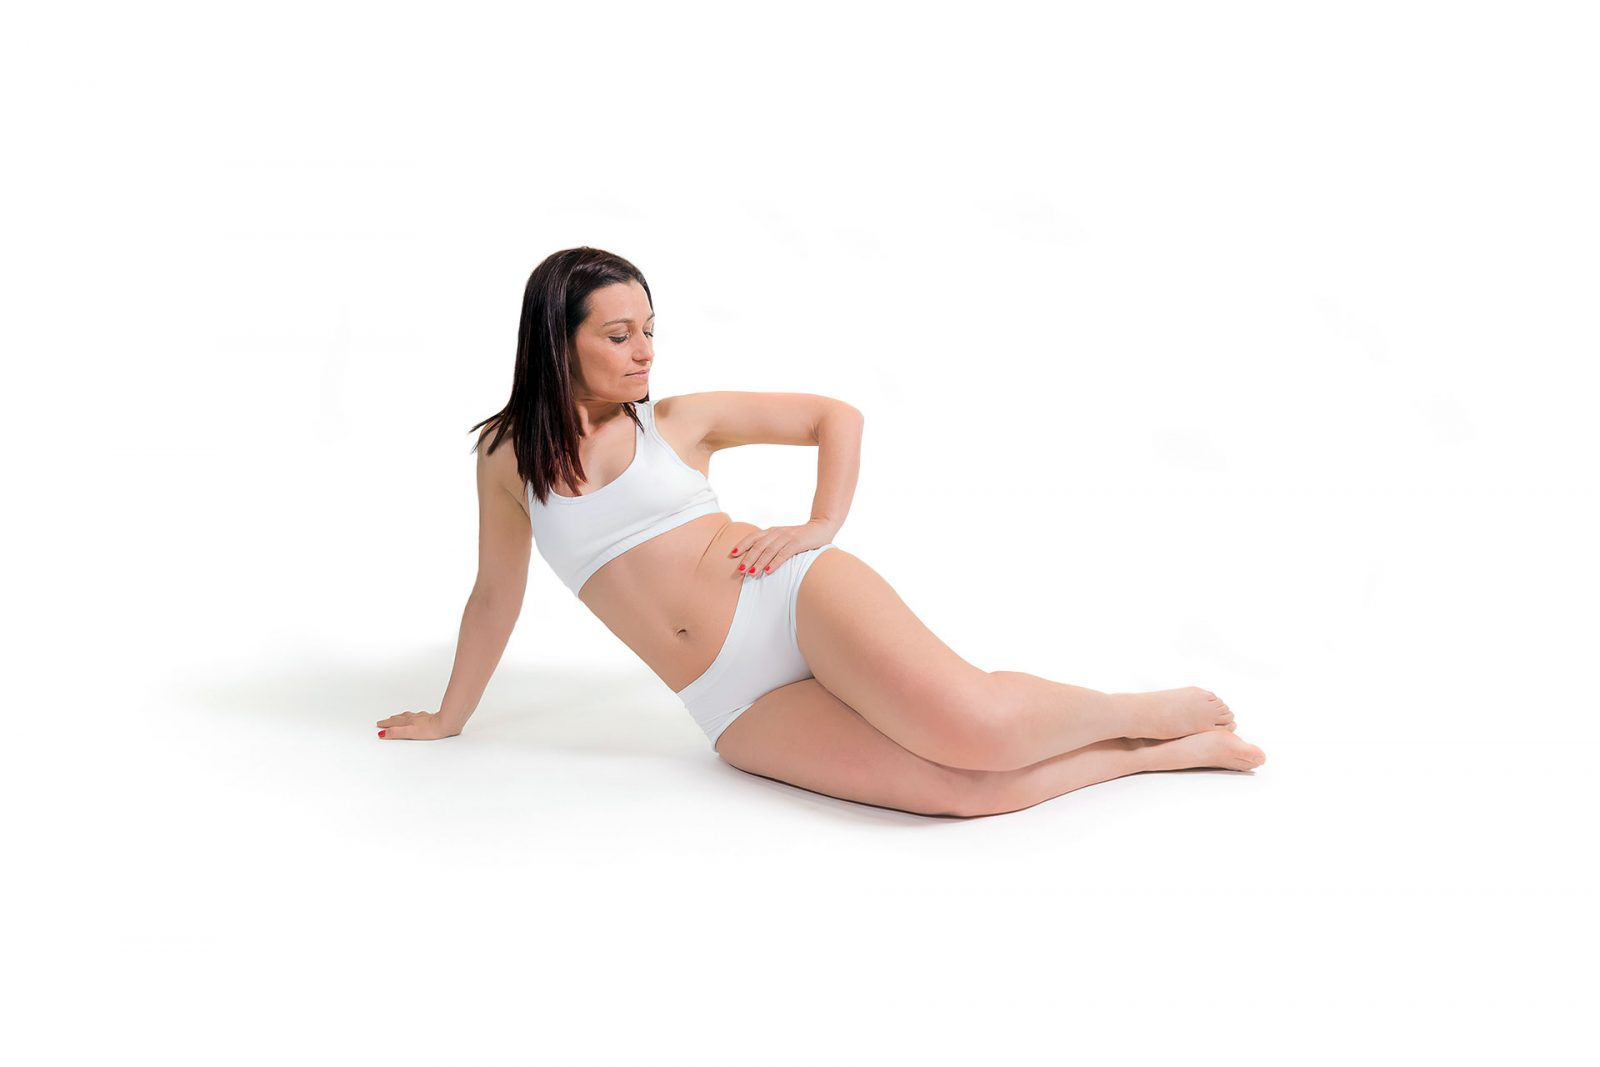 bodyscience-clinica-estetica-problemas-corpo-mulher